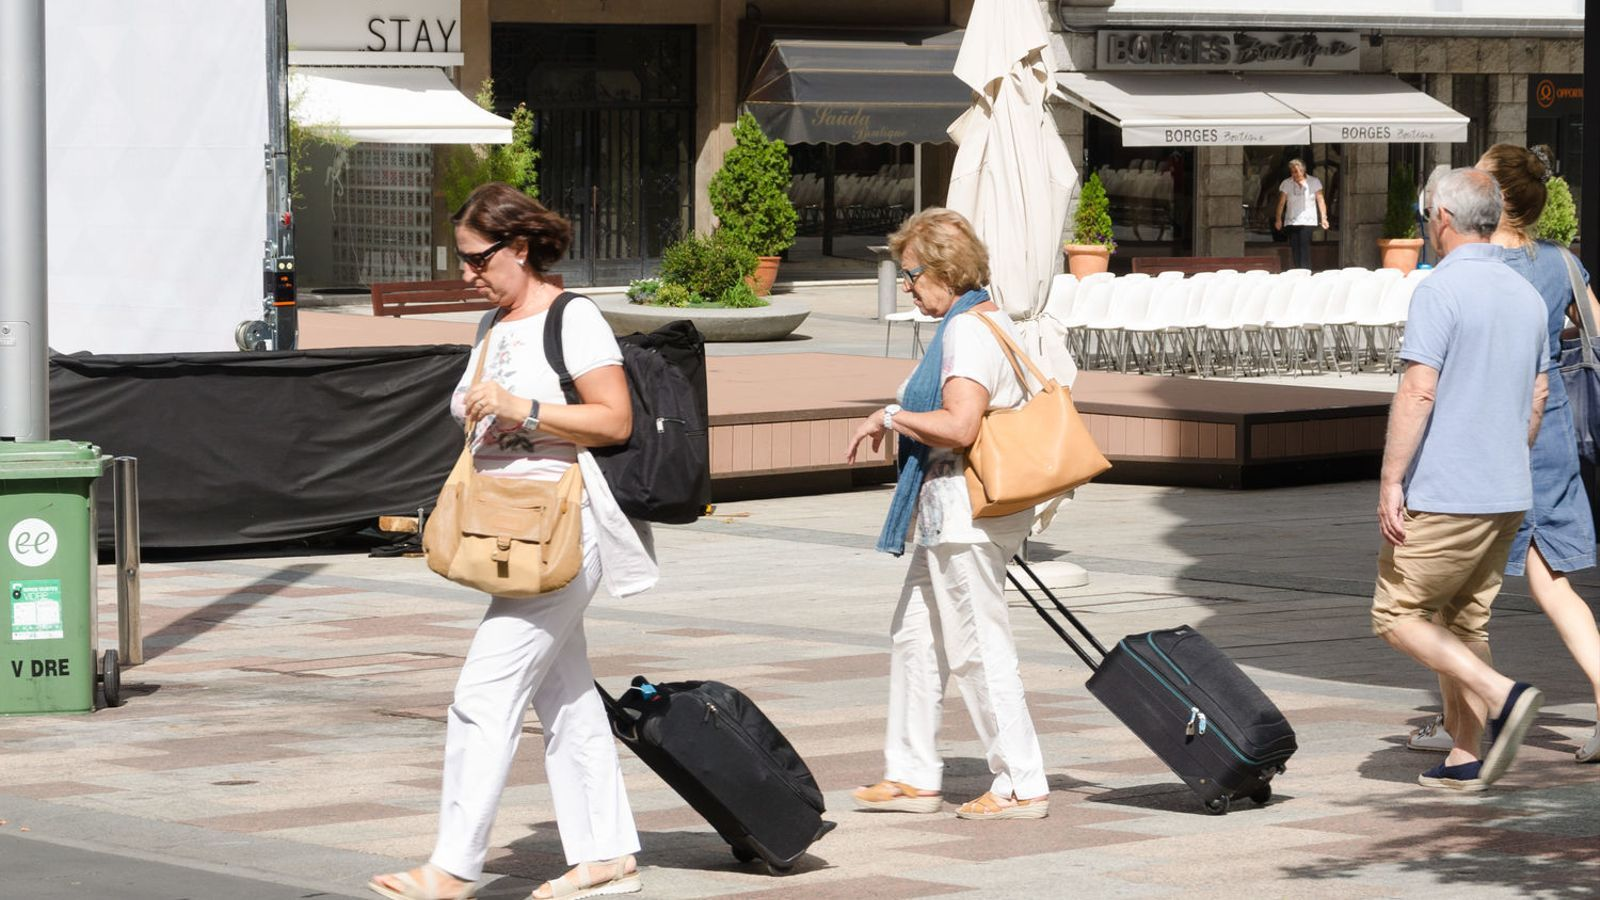 Turistes a Escaldes-Engordany. / ARXIU ANA